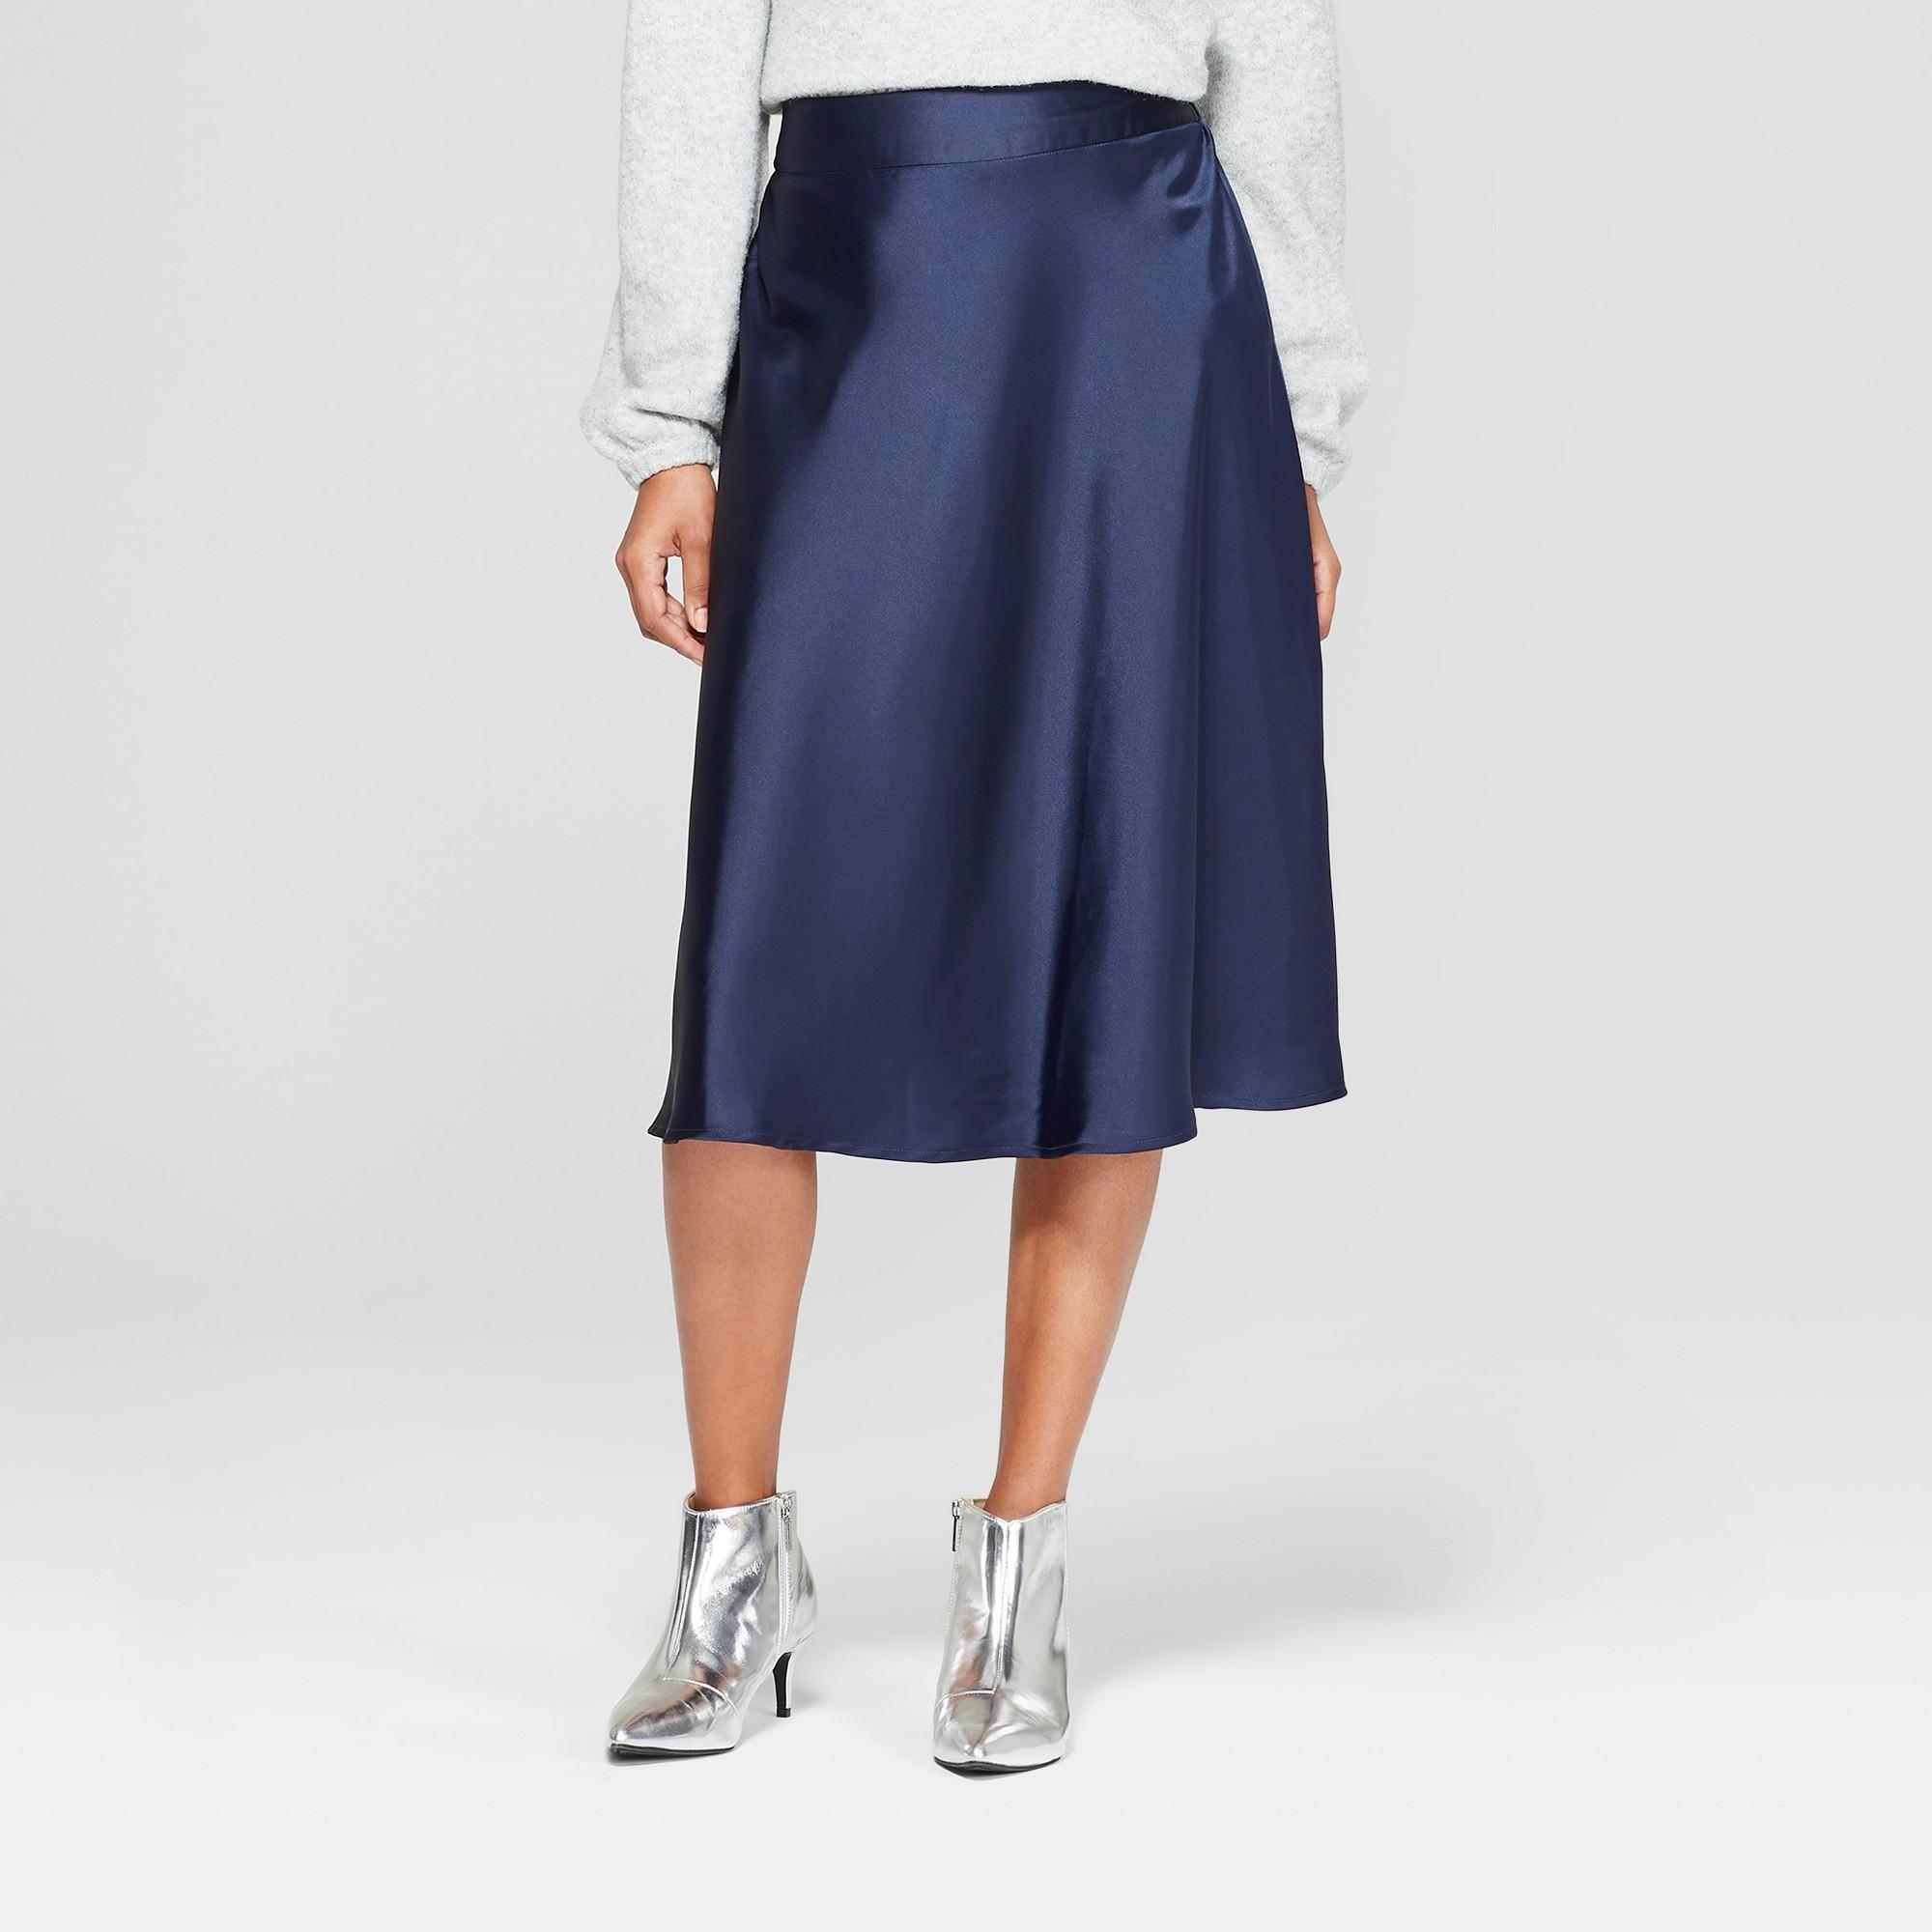 fdaf2ba28 Navy Blue Satin Midi Skirt – DACC